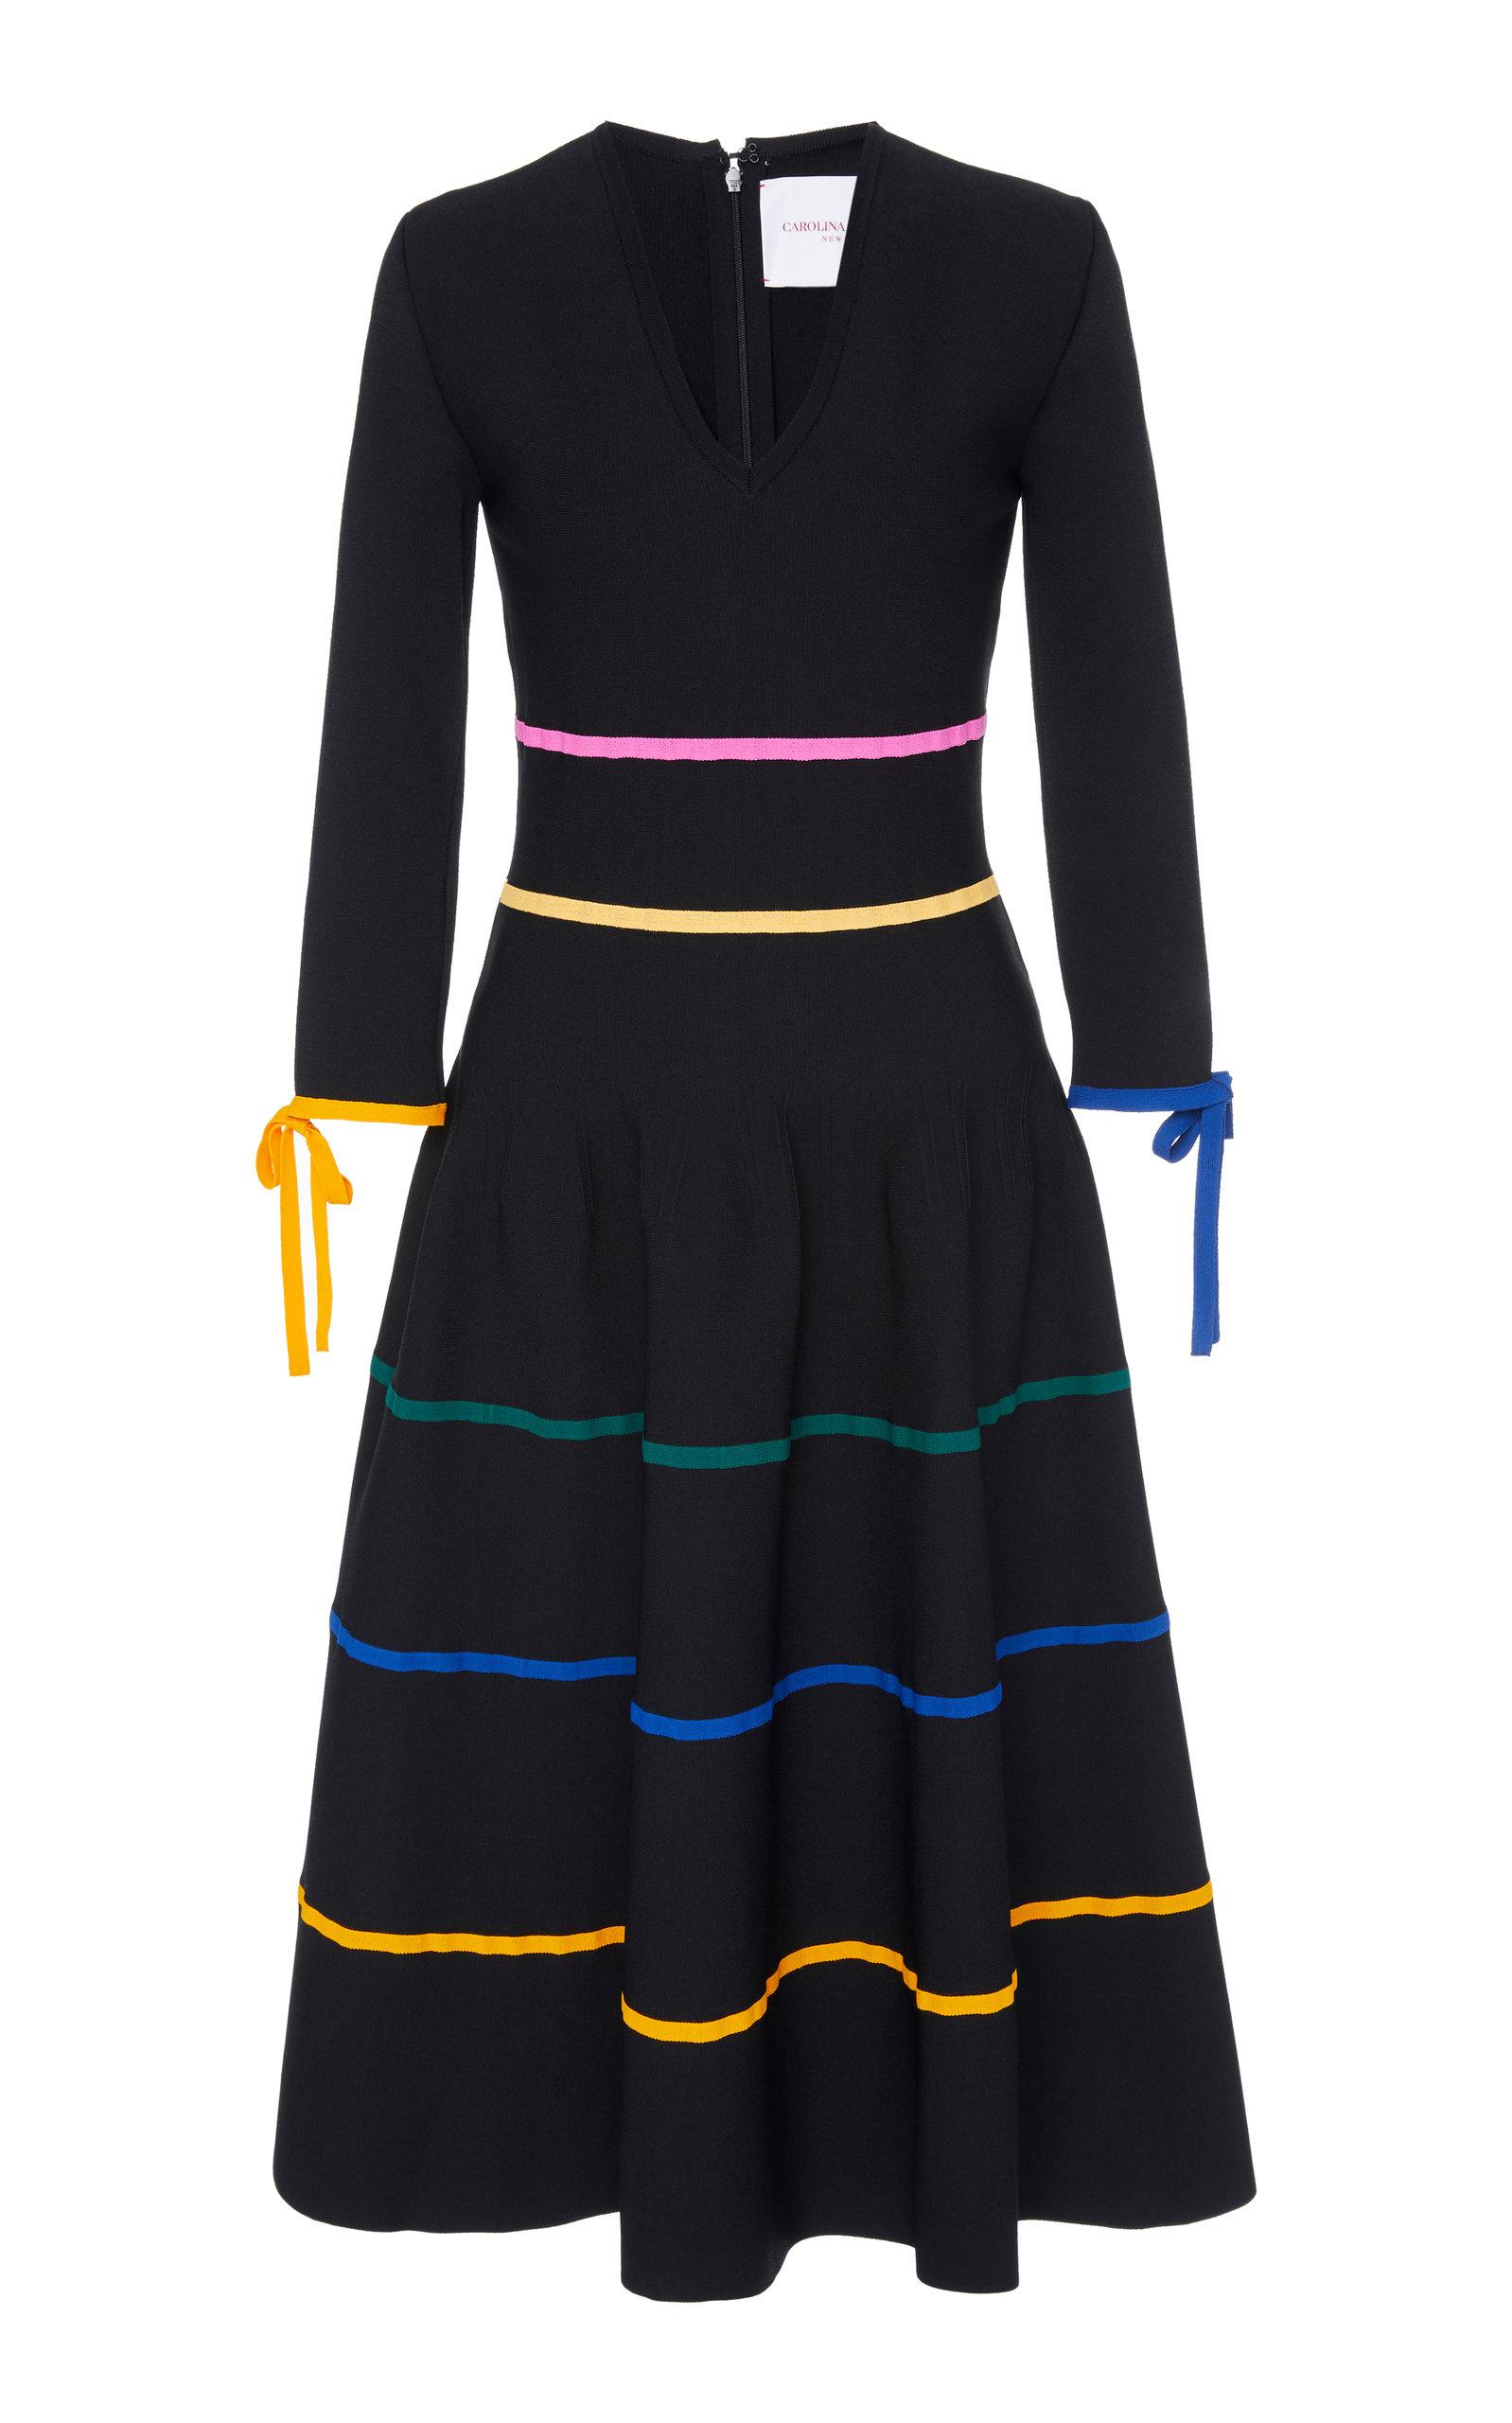 3/4 Sleeve Knit A-Line Dress Carolina Herrera Clearance Release Dates Online Store Clearance Amazon u6iaN4tNZq